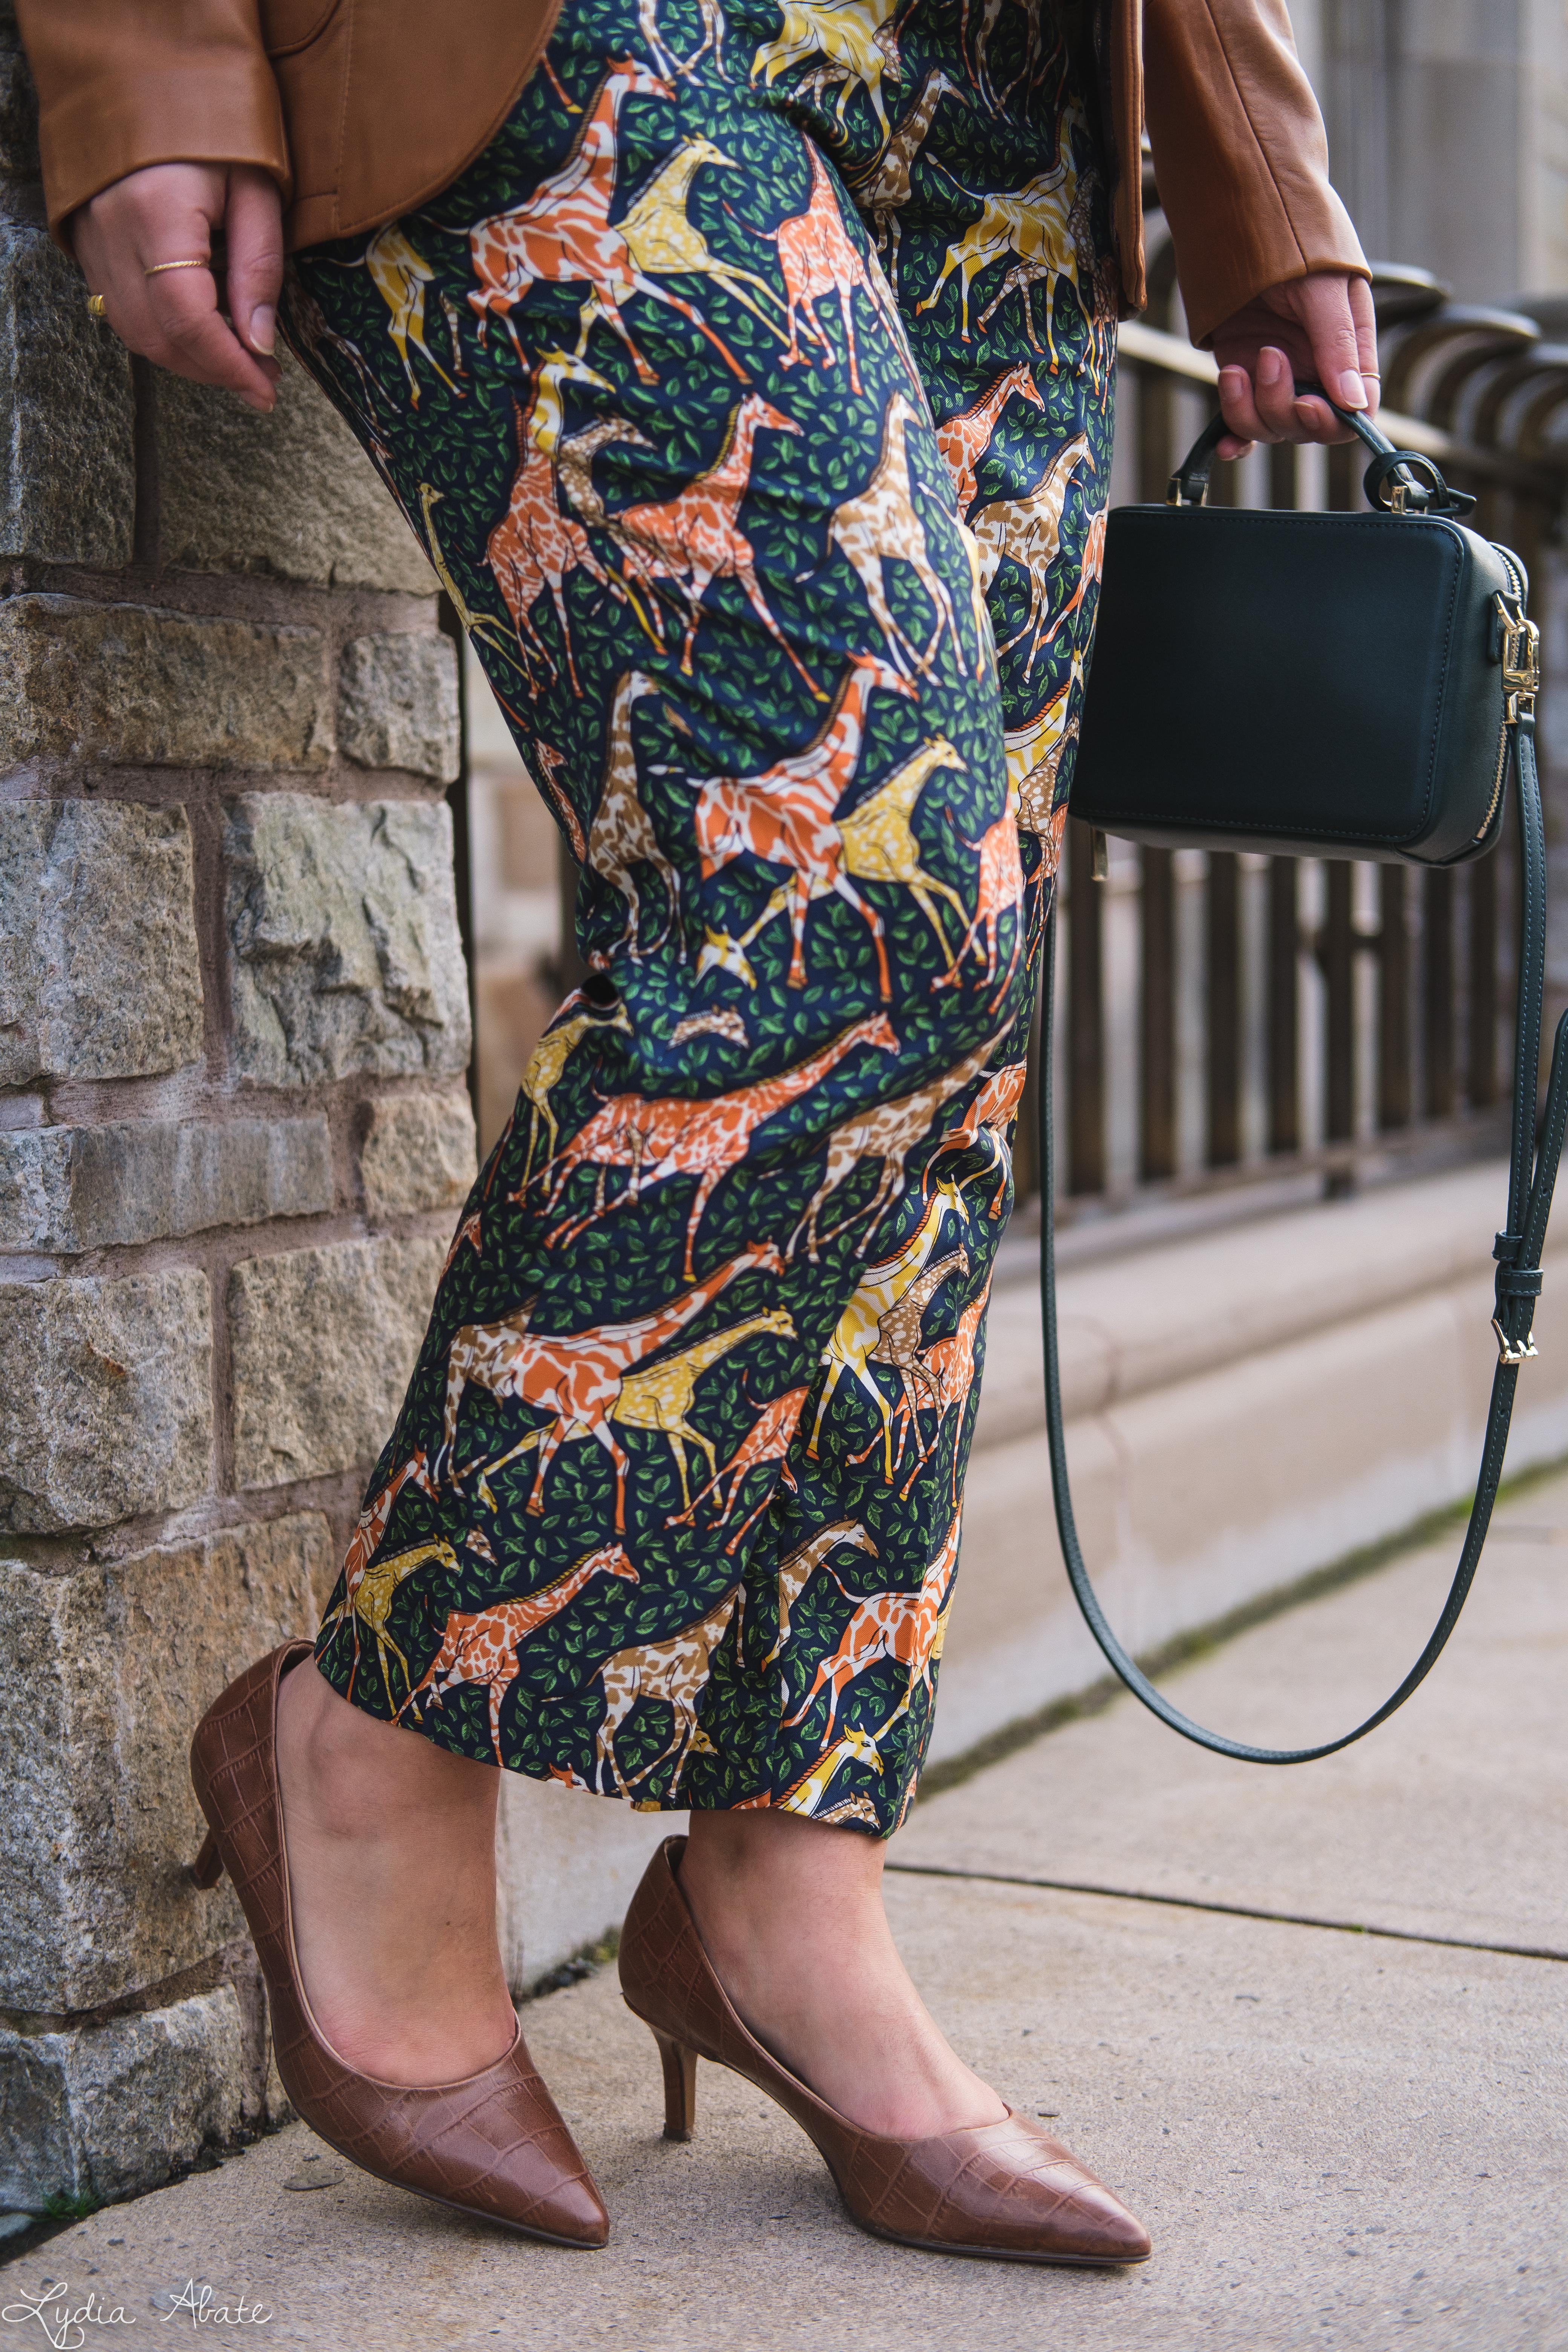 giraffe pants, leather blazer knit top, green bag, croc heels-9.jpg